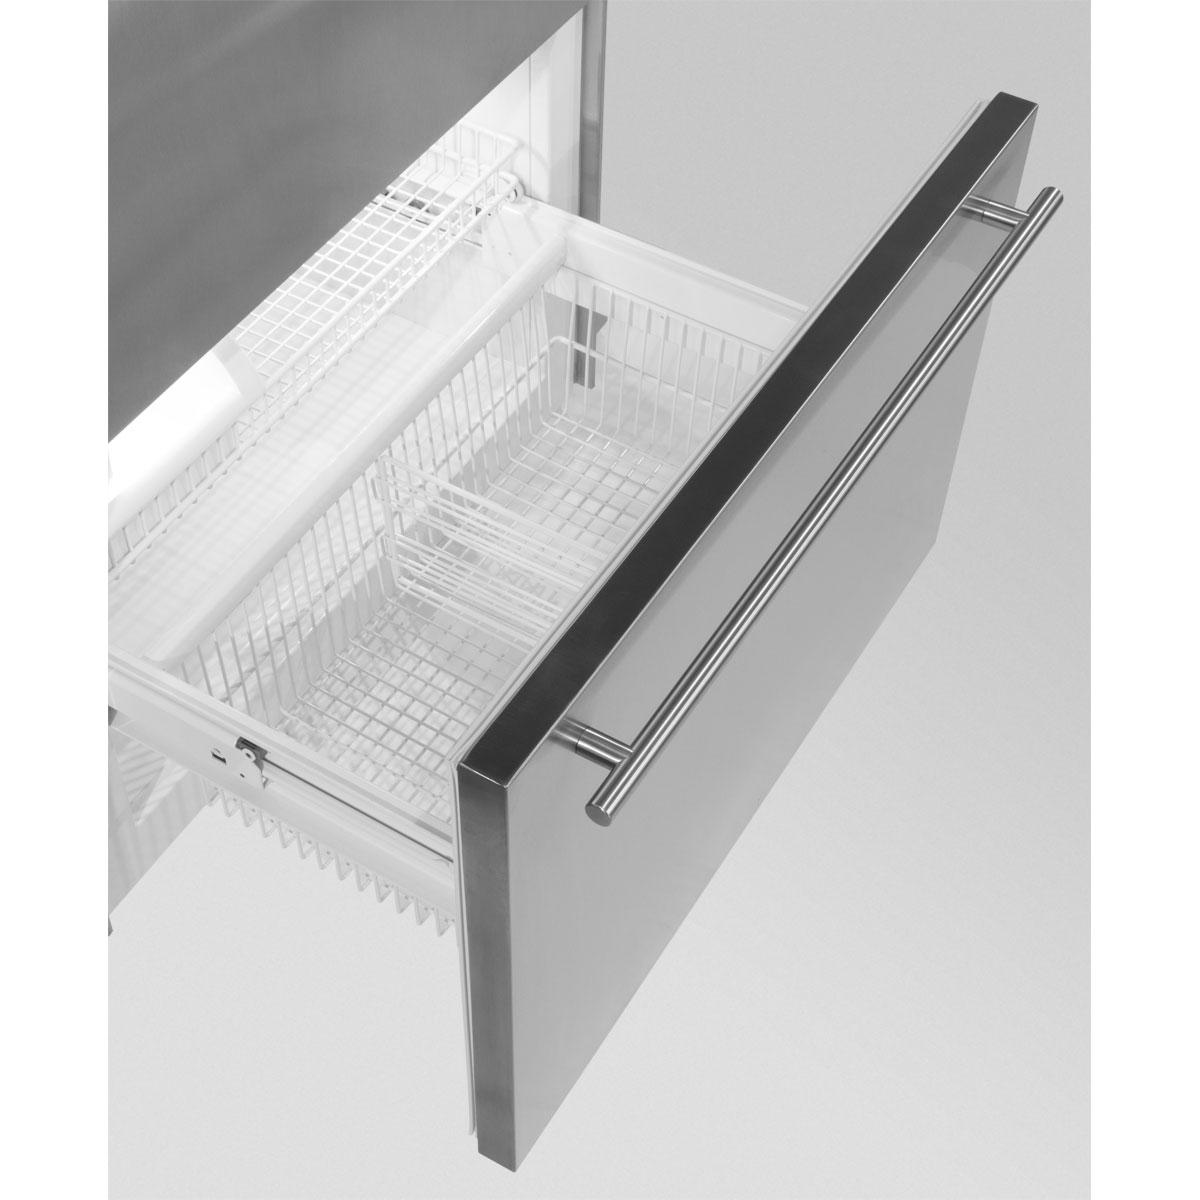 "Model: 42249471 | Marvel  Marvel Professional Built-In 36"" Bottom Freezer Refrigerator- Optional Accessories Professional Handle  Horizontal Freezer Door Installation (qty 1)"